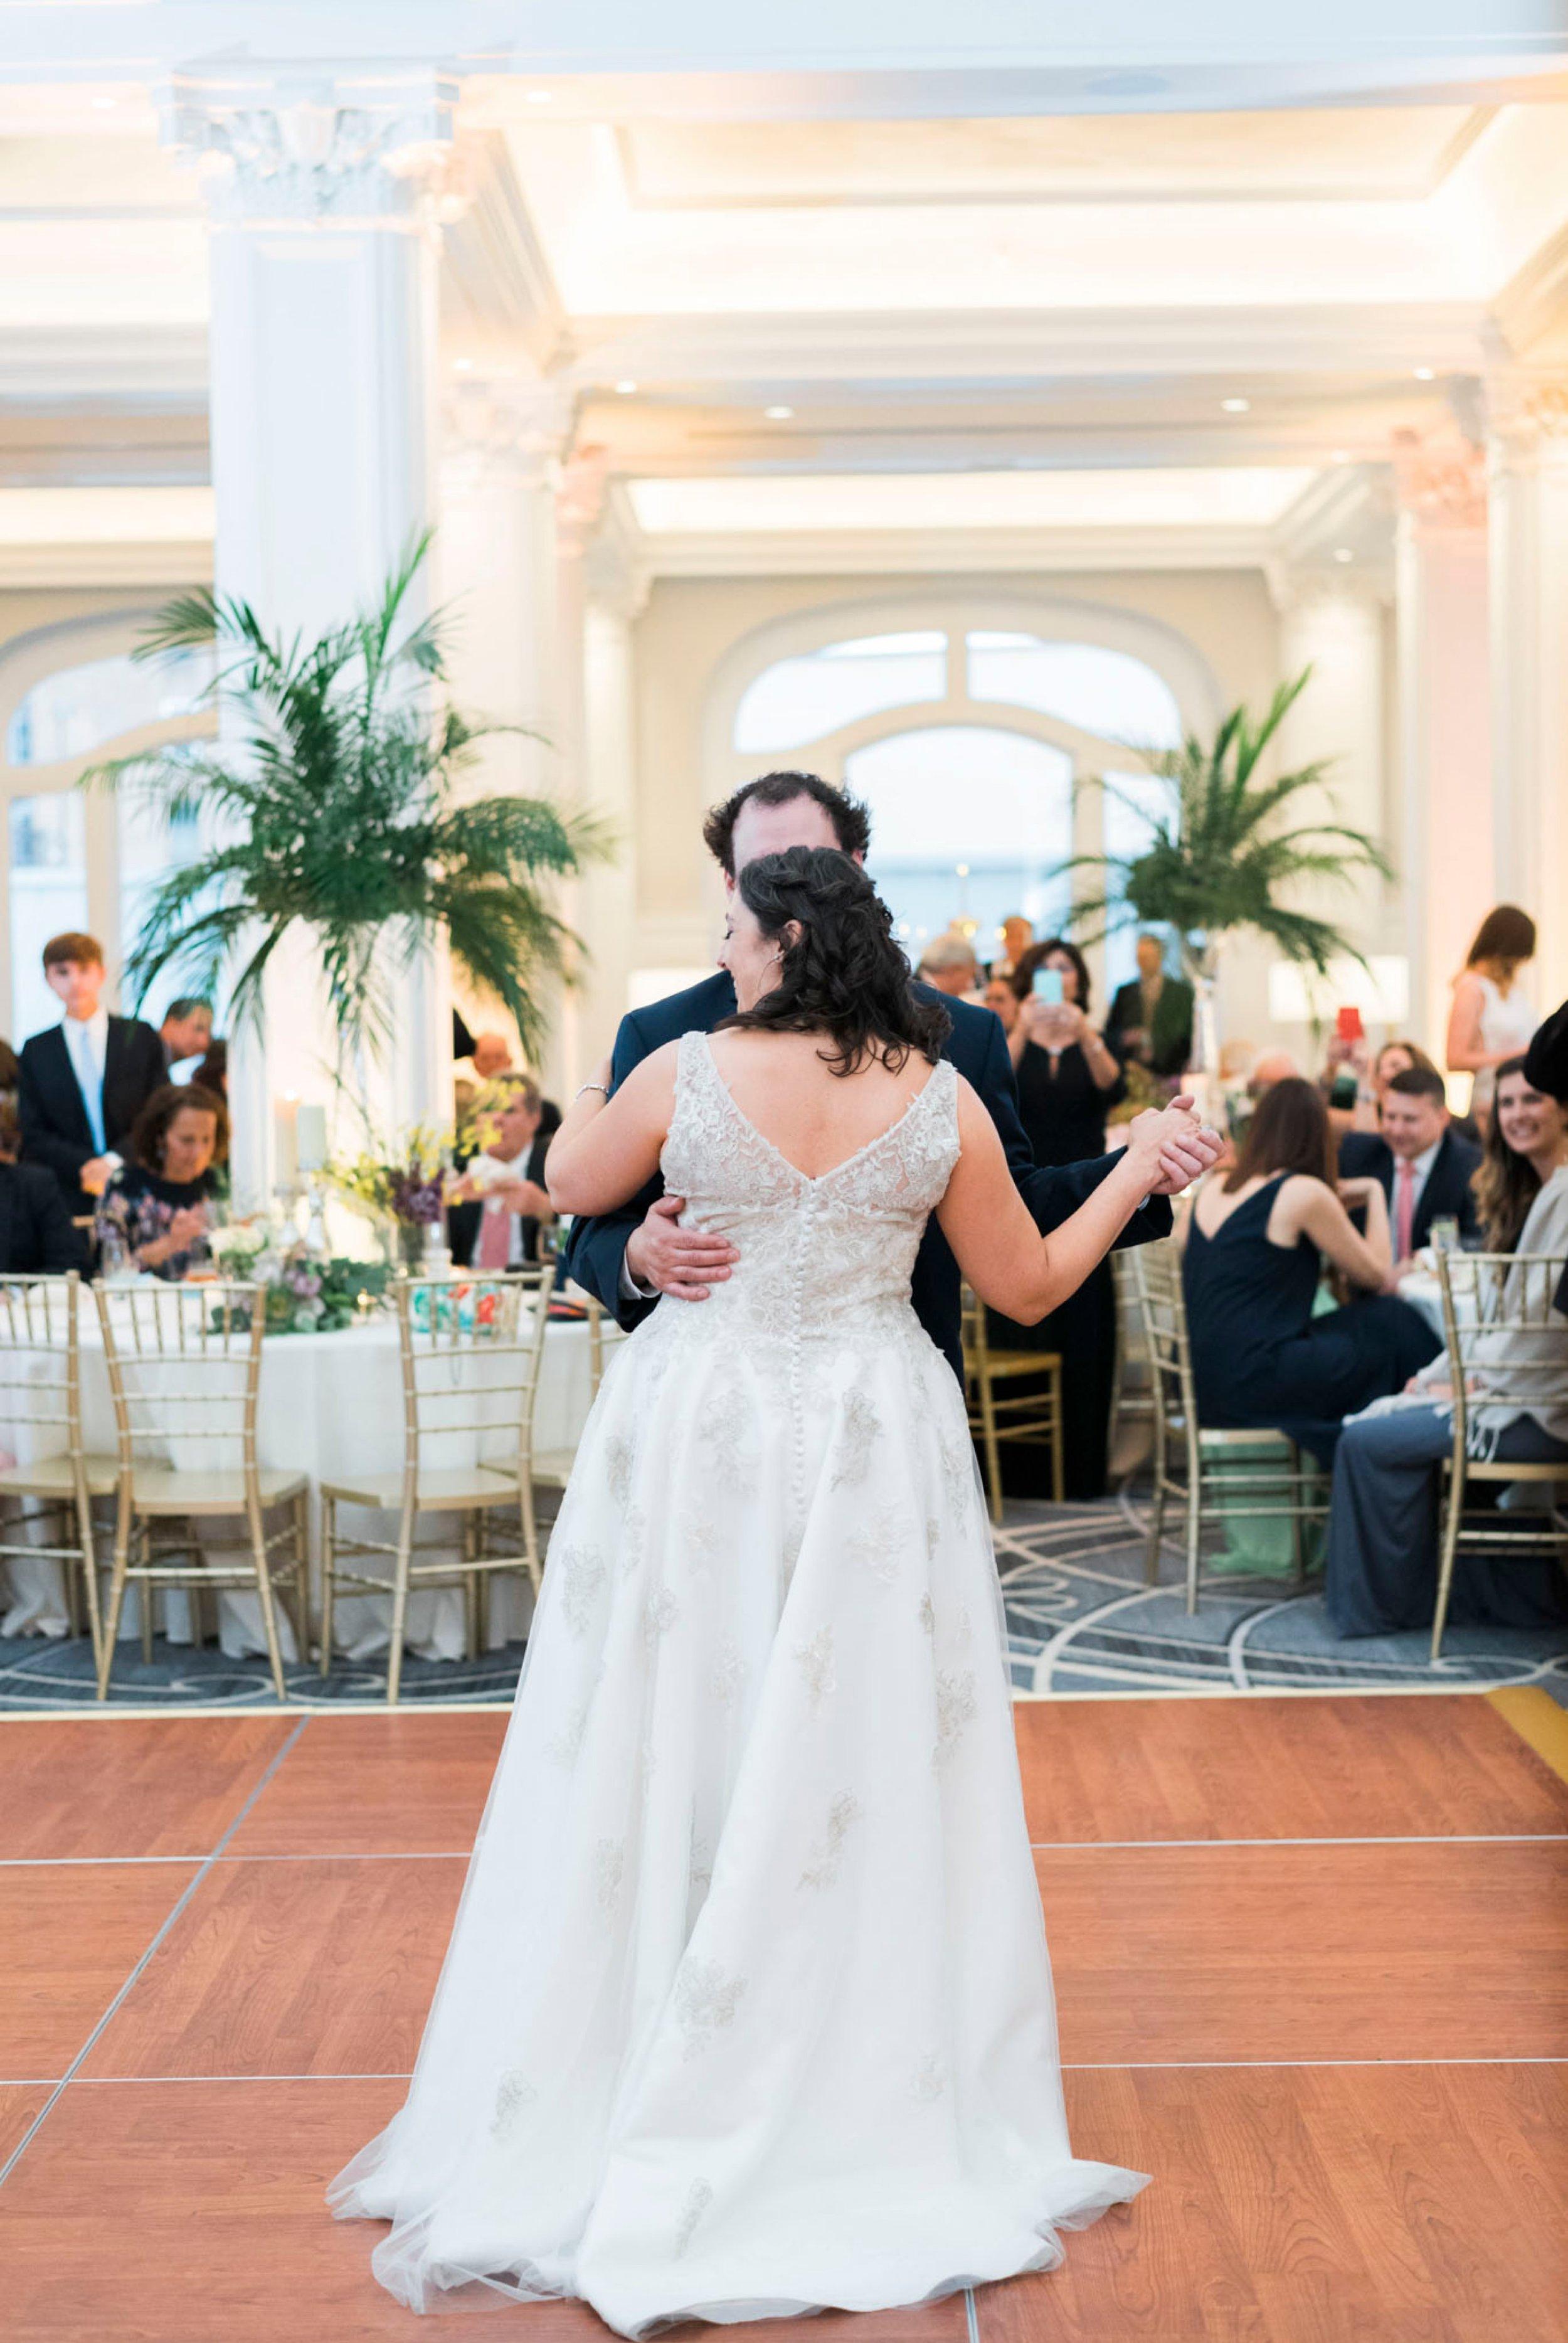 TheVirginianHotel_LynchburgVA_TheVirginianHotelWedding_Virginiaweddingphotographer_Lynchburgvawedding 16.jpg